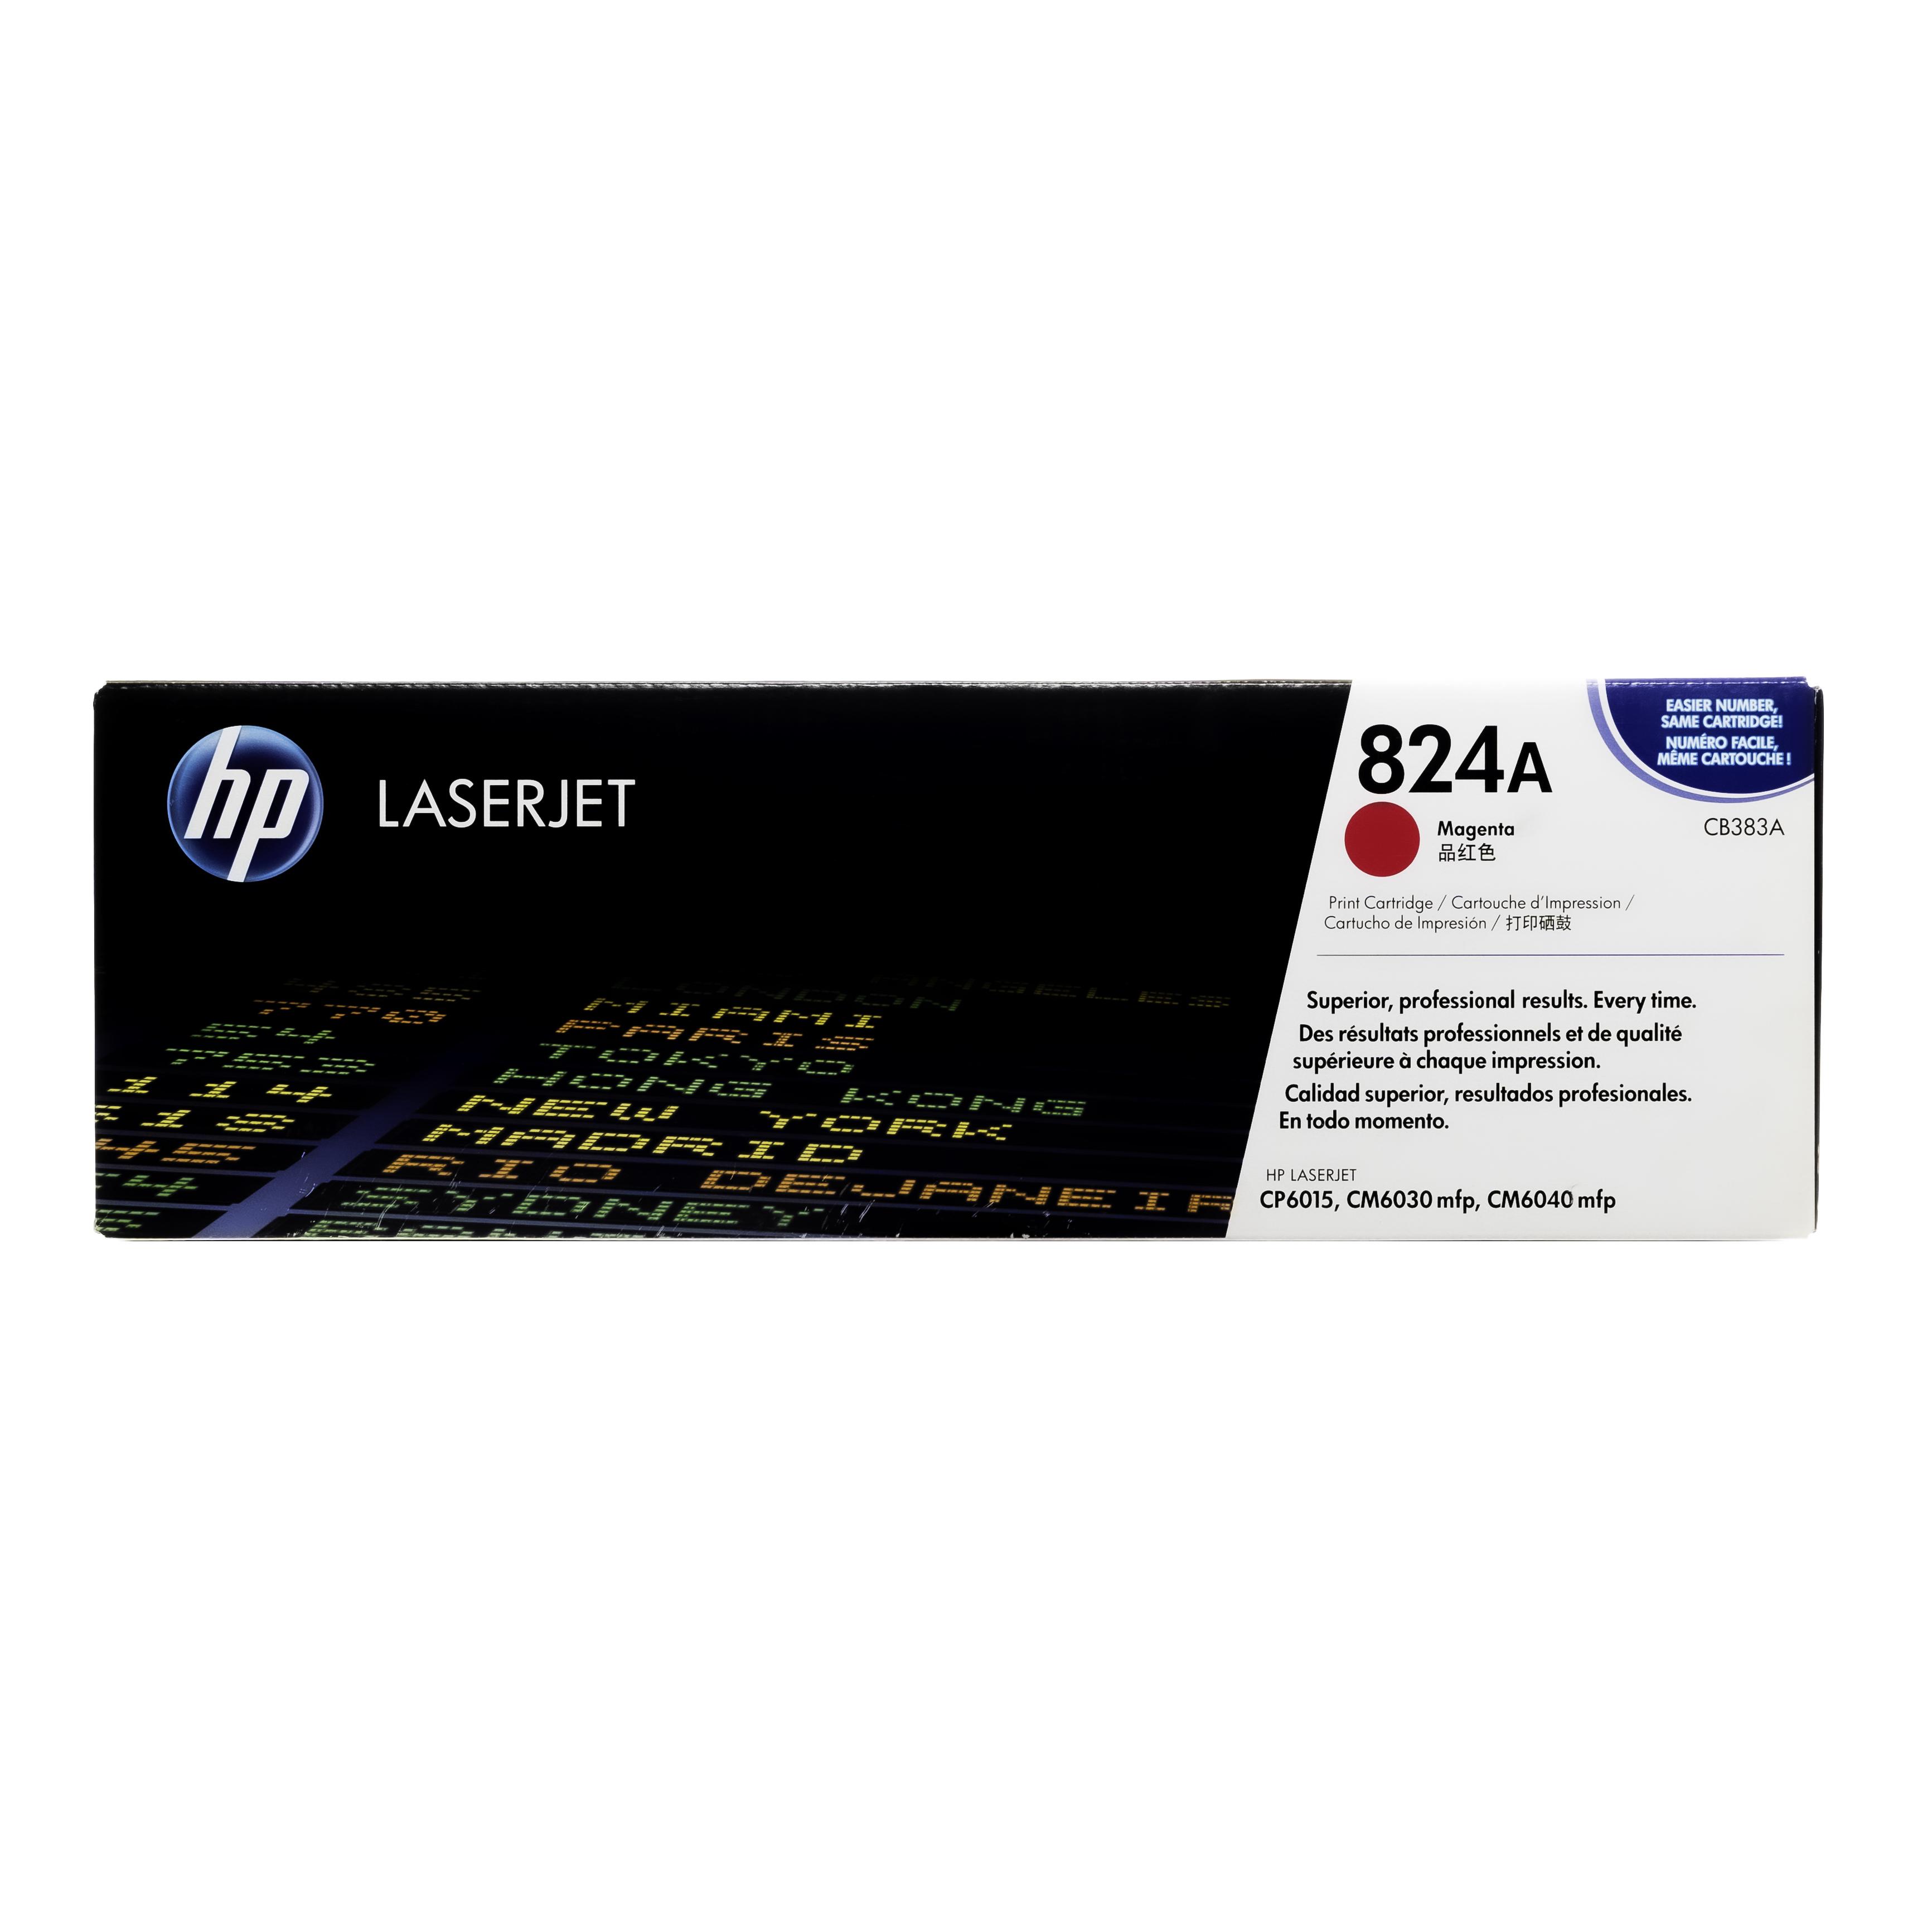 CB383A | HP 824A | Original HP Toner Cartridge – Magenta